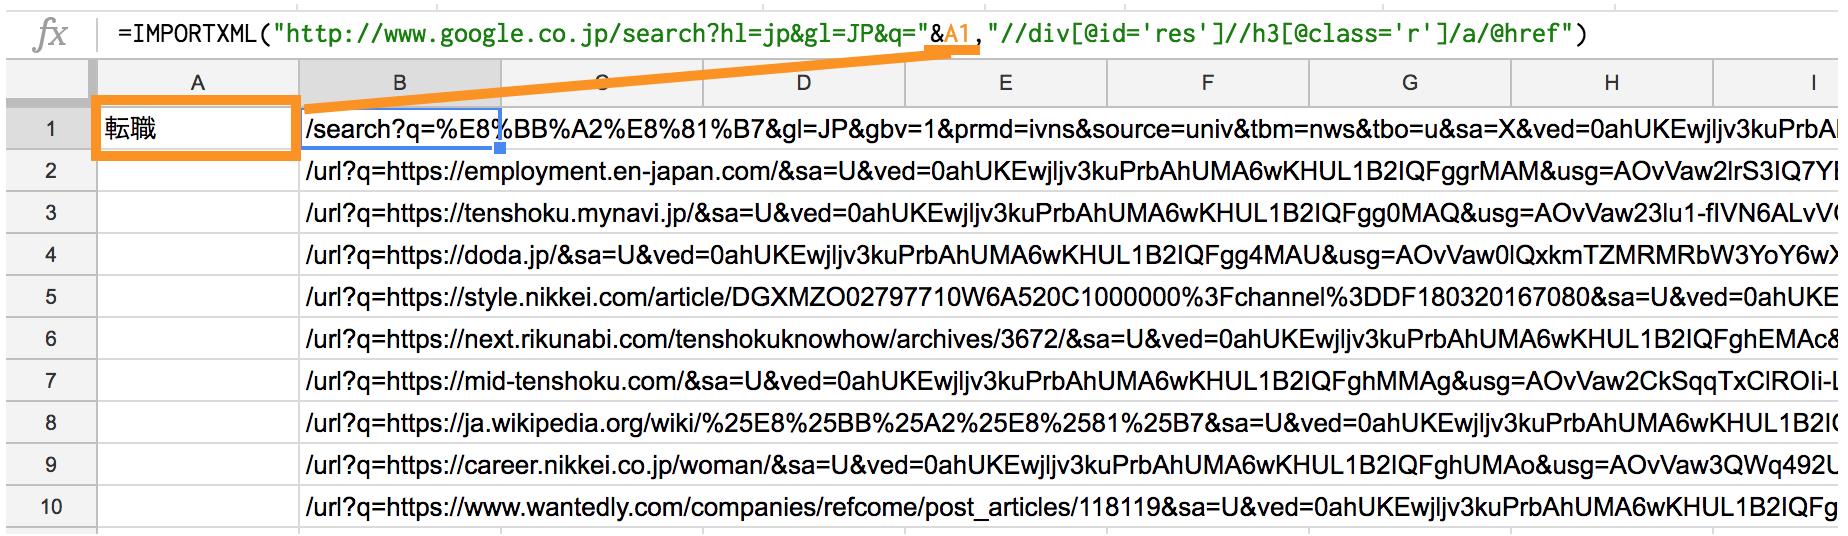 importxmlでGoogle検索結果を取得